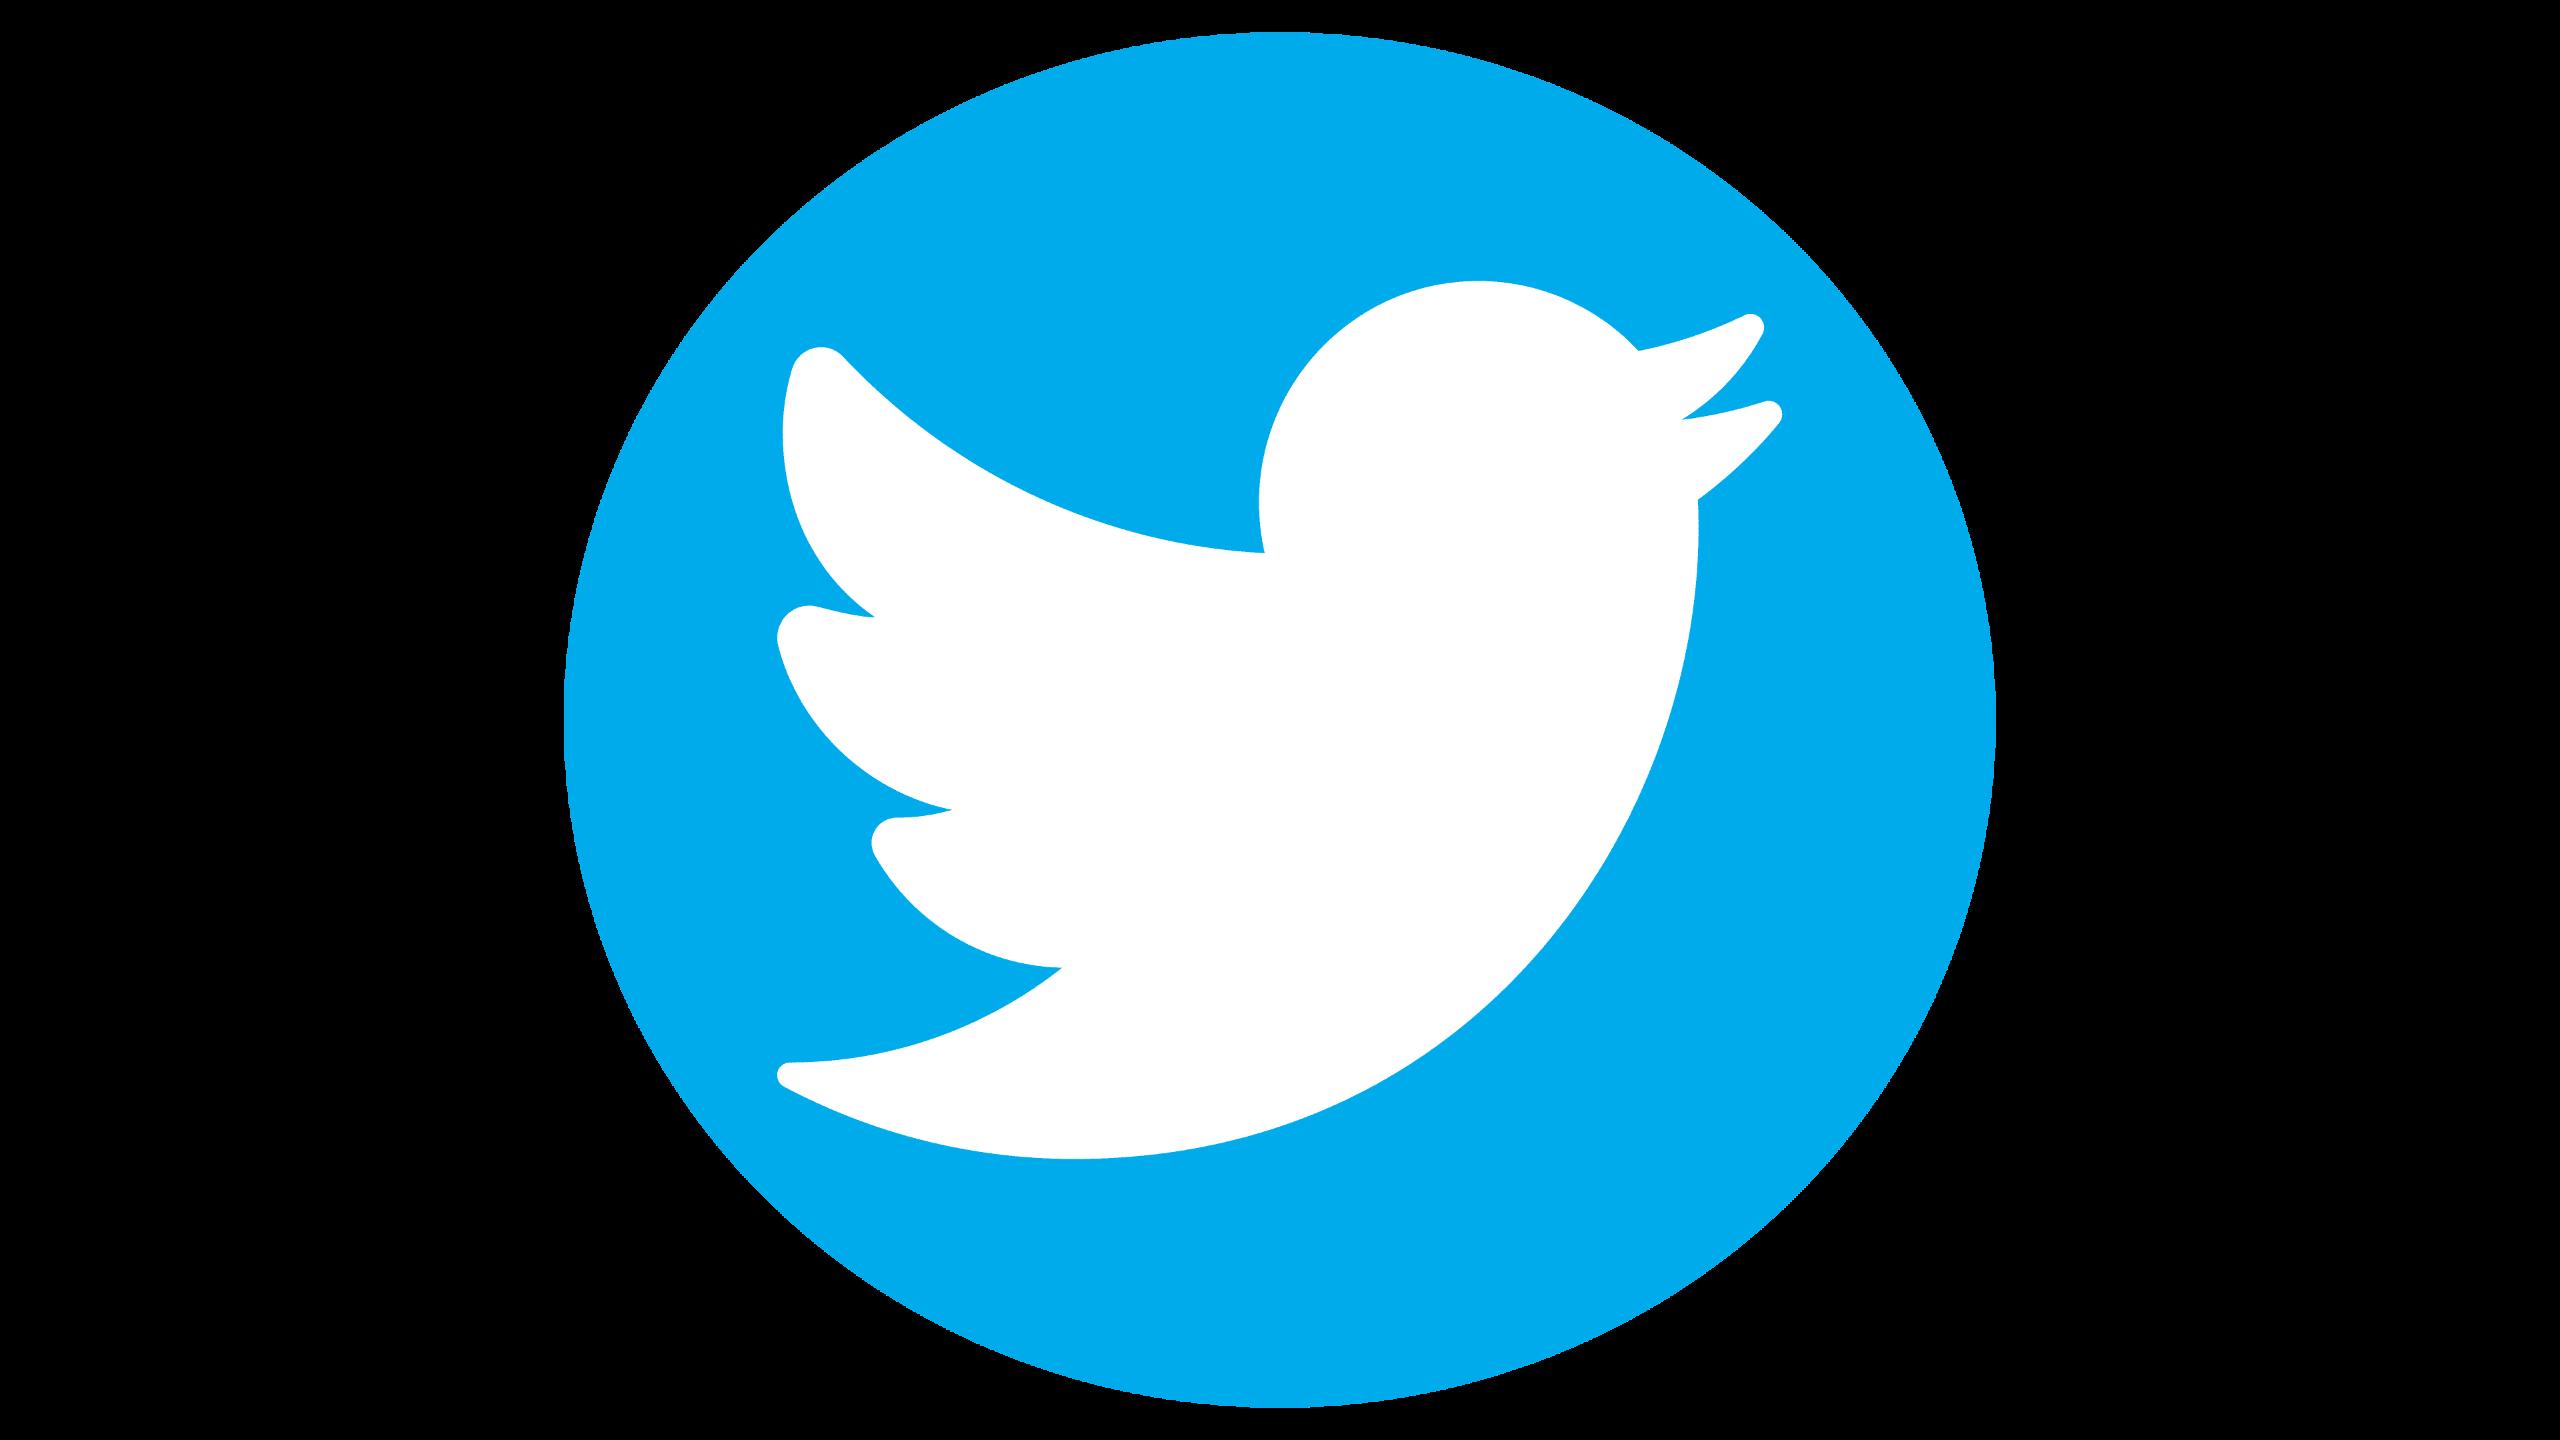 Twitter Symbol